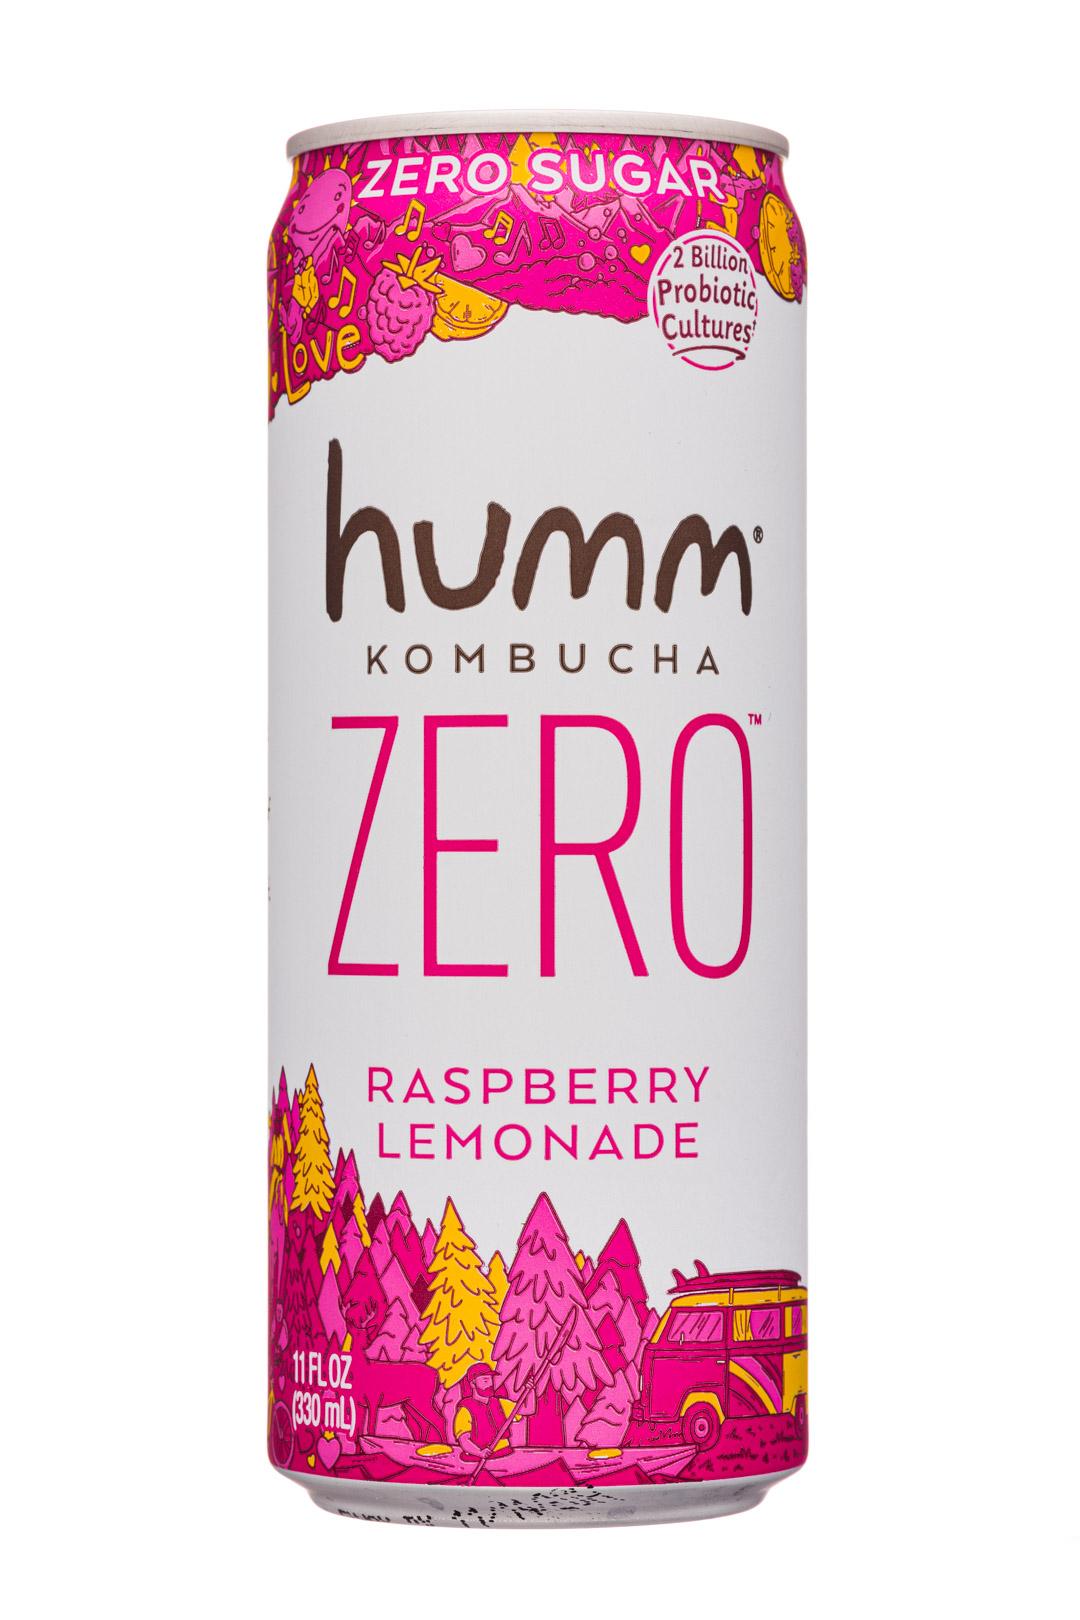 humm kombucha: Humm-11oz-2020-KombuchaZero-RaspLemonade-Front